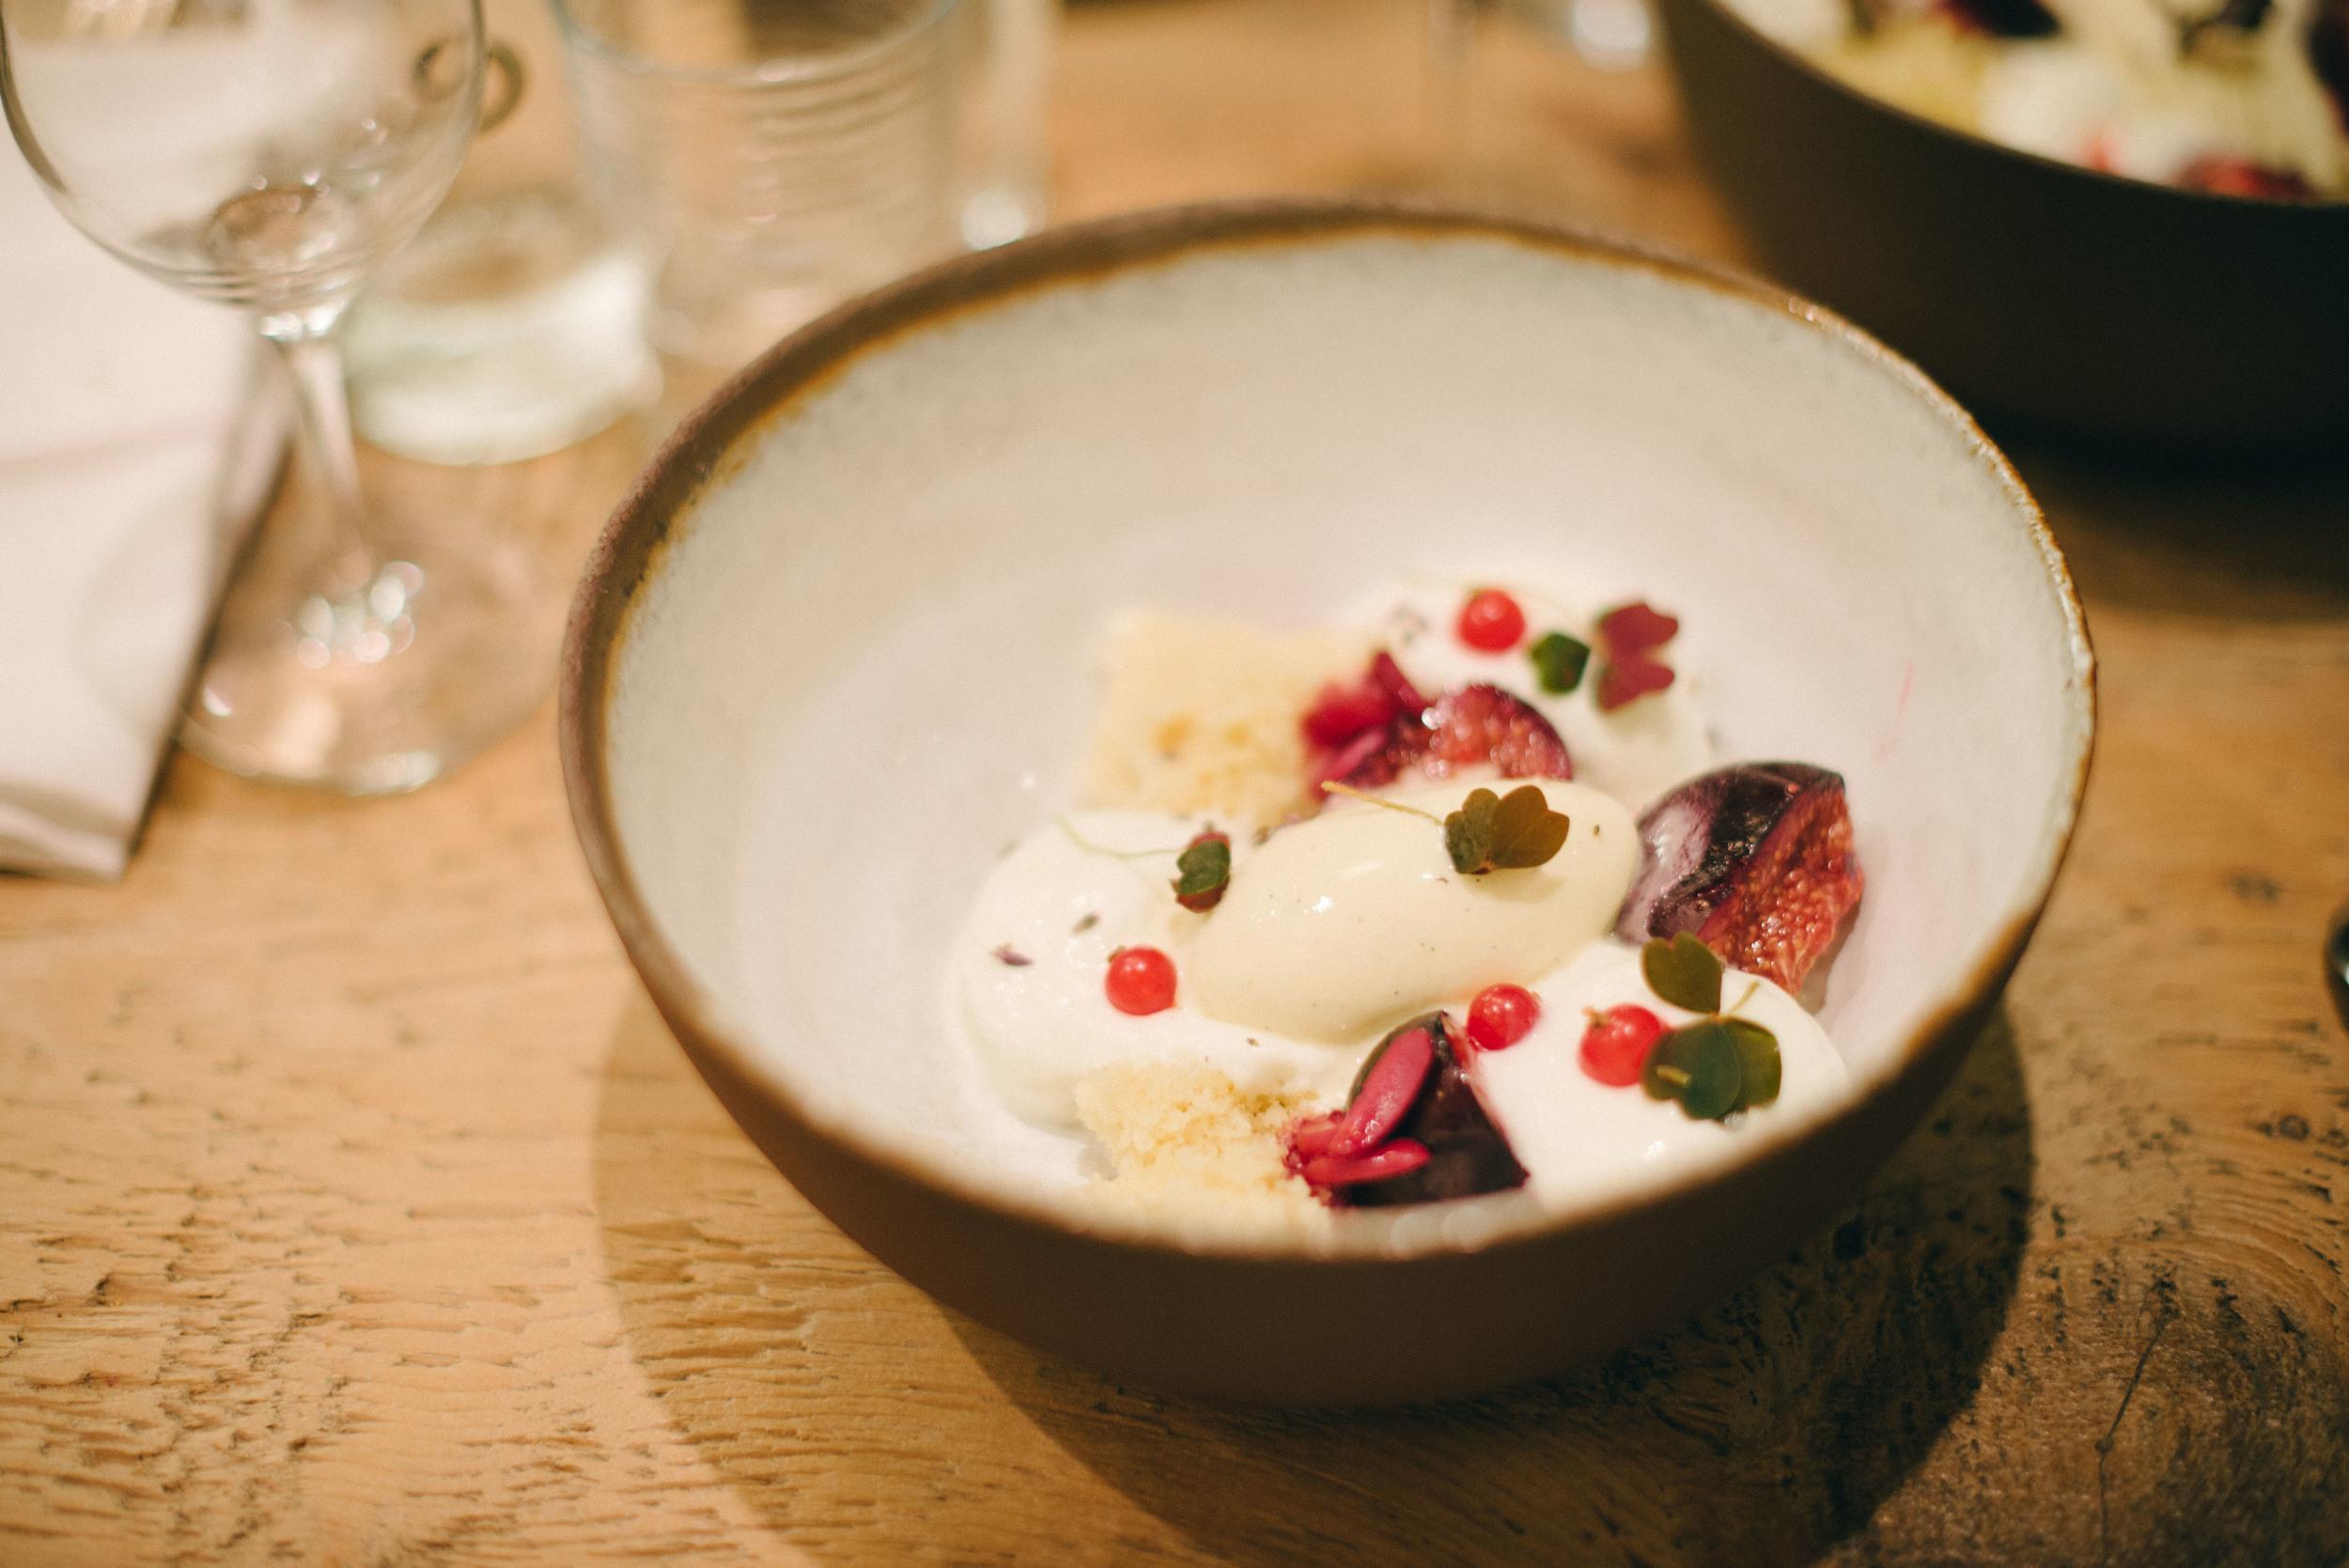 clover-restaurant-dessert-paris